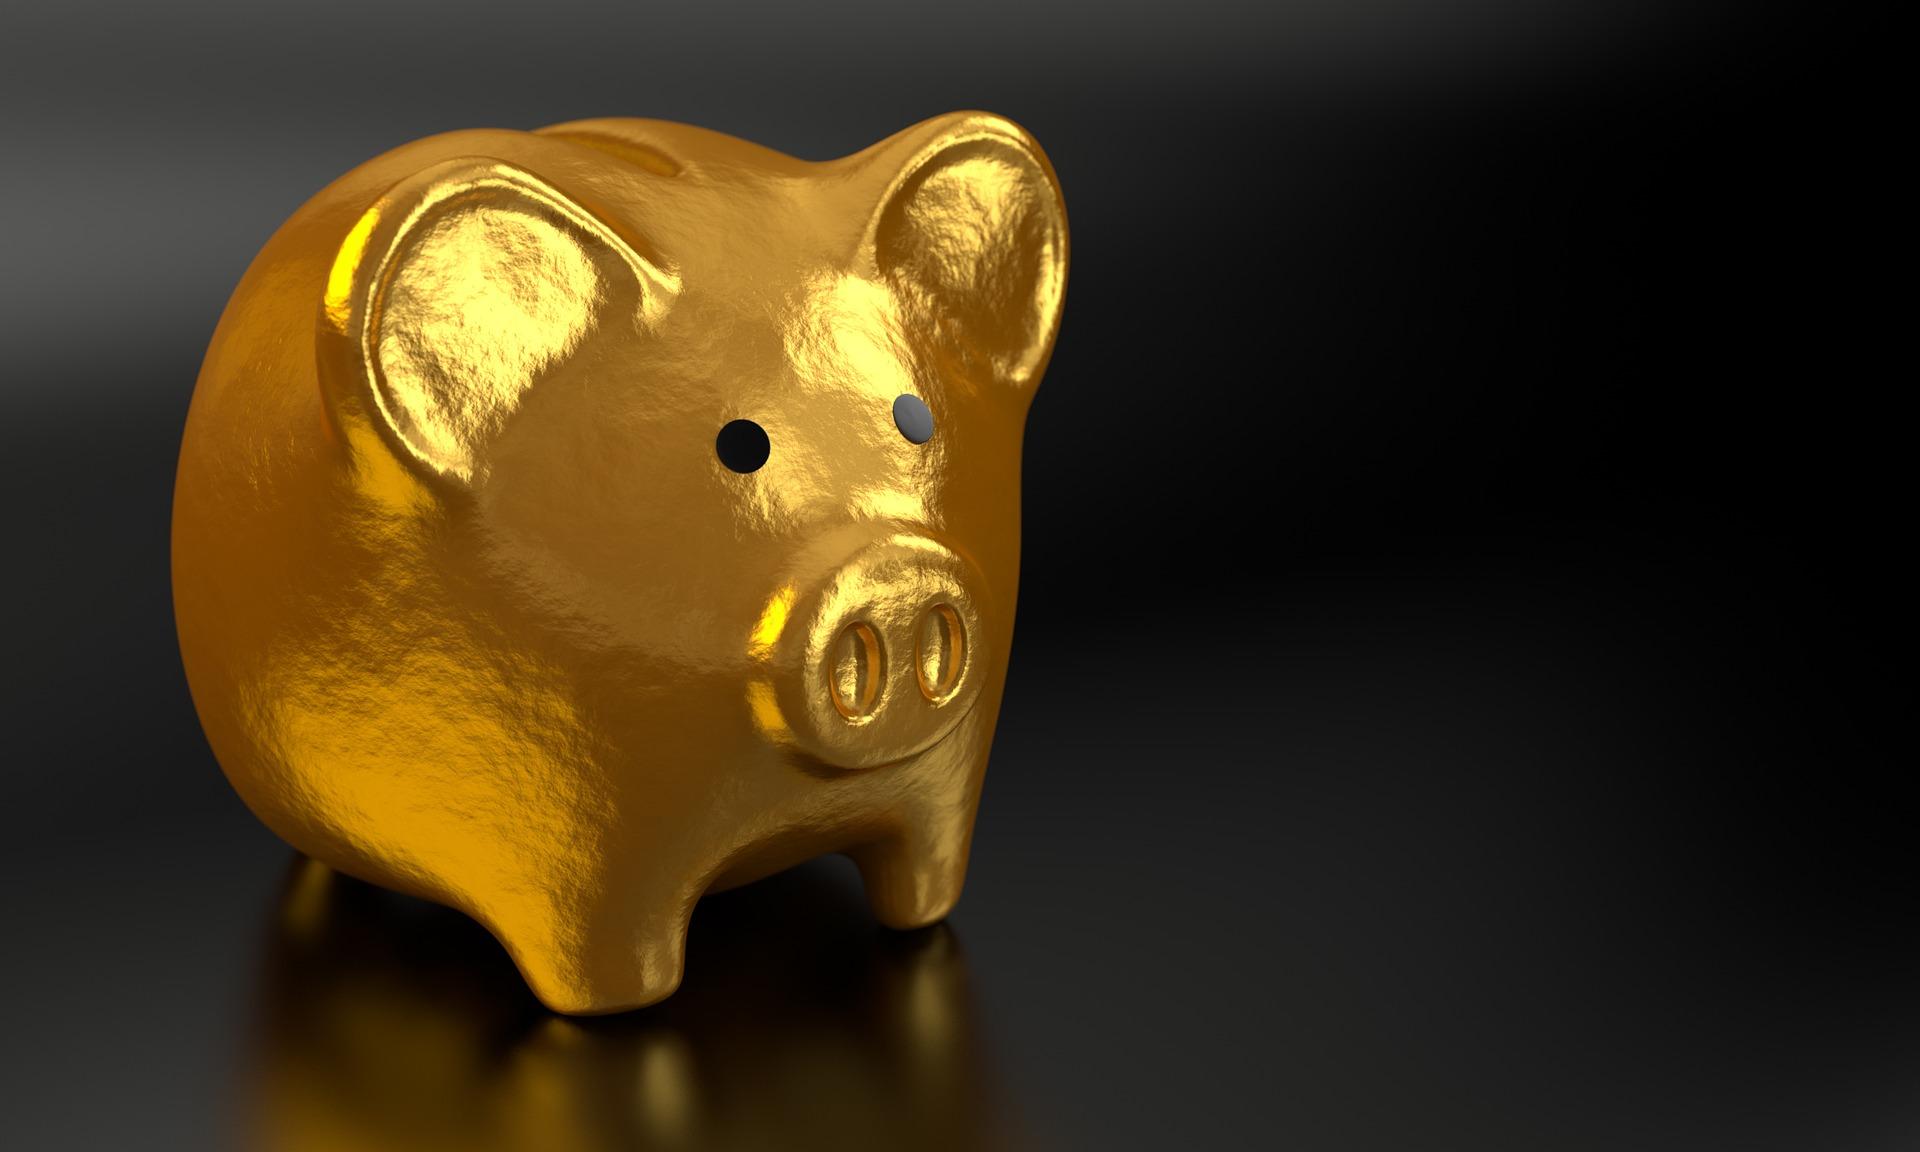 Gold Piggy Bank Savings